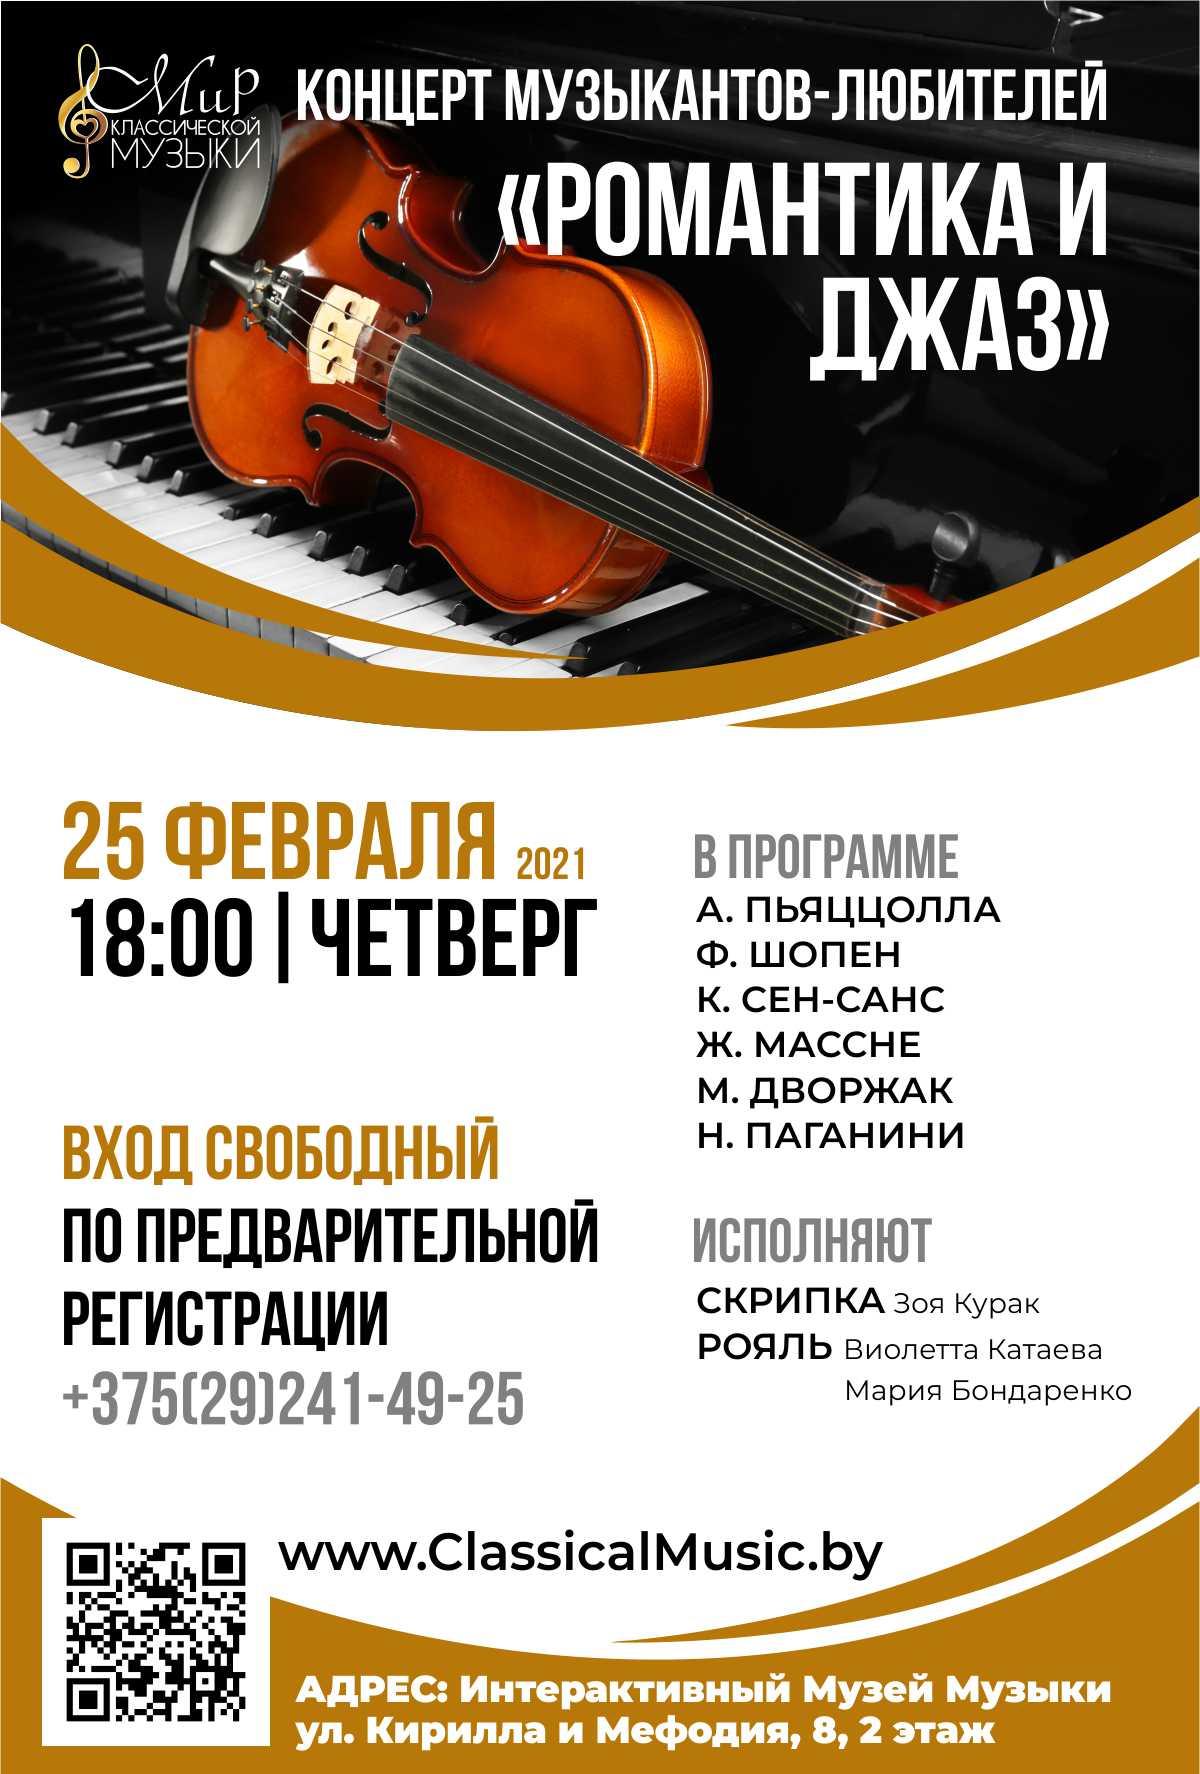 Любительский концерт Романтика и джаз